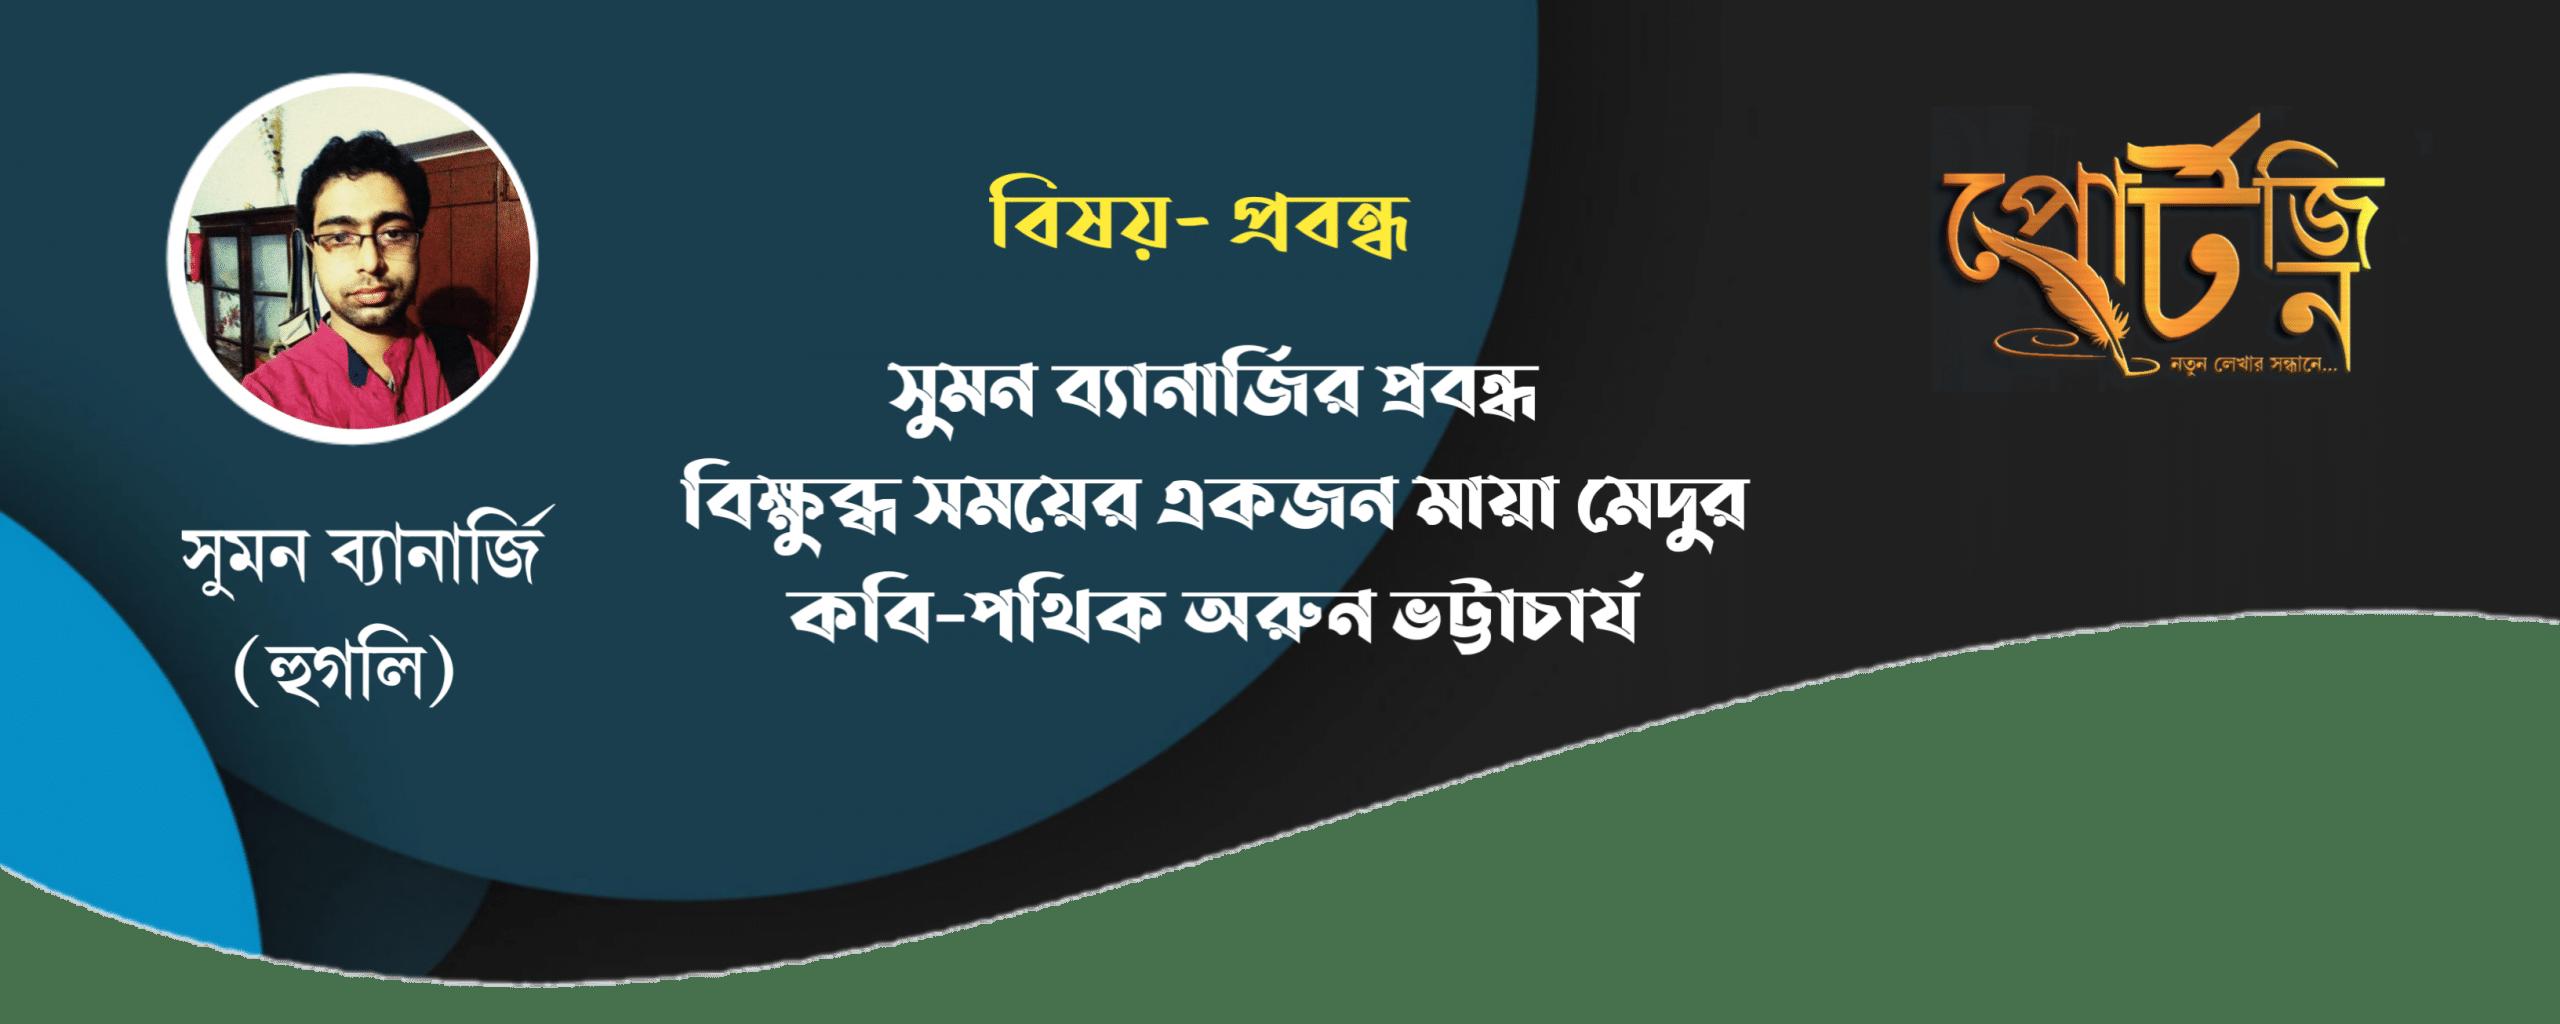 bangla  golpo bengal live portzine